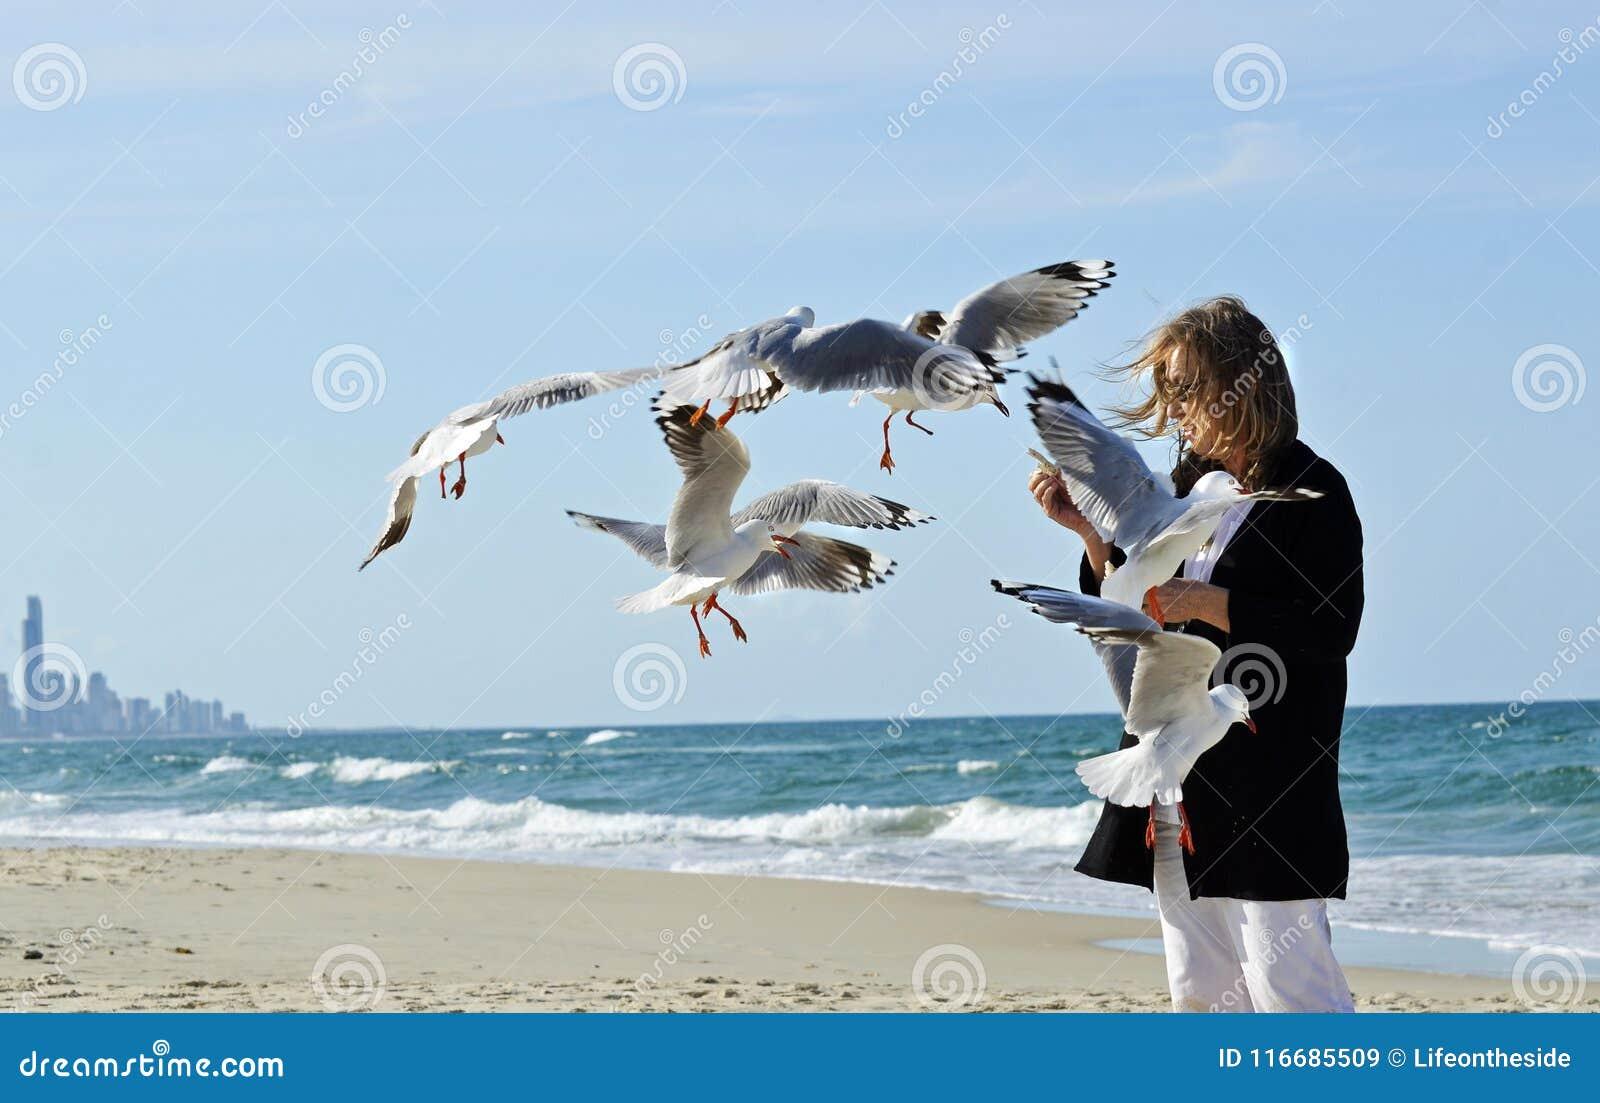 Happy healthy mature woman hand feeding seagulls birds on beach